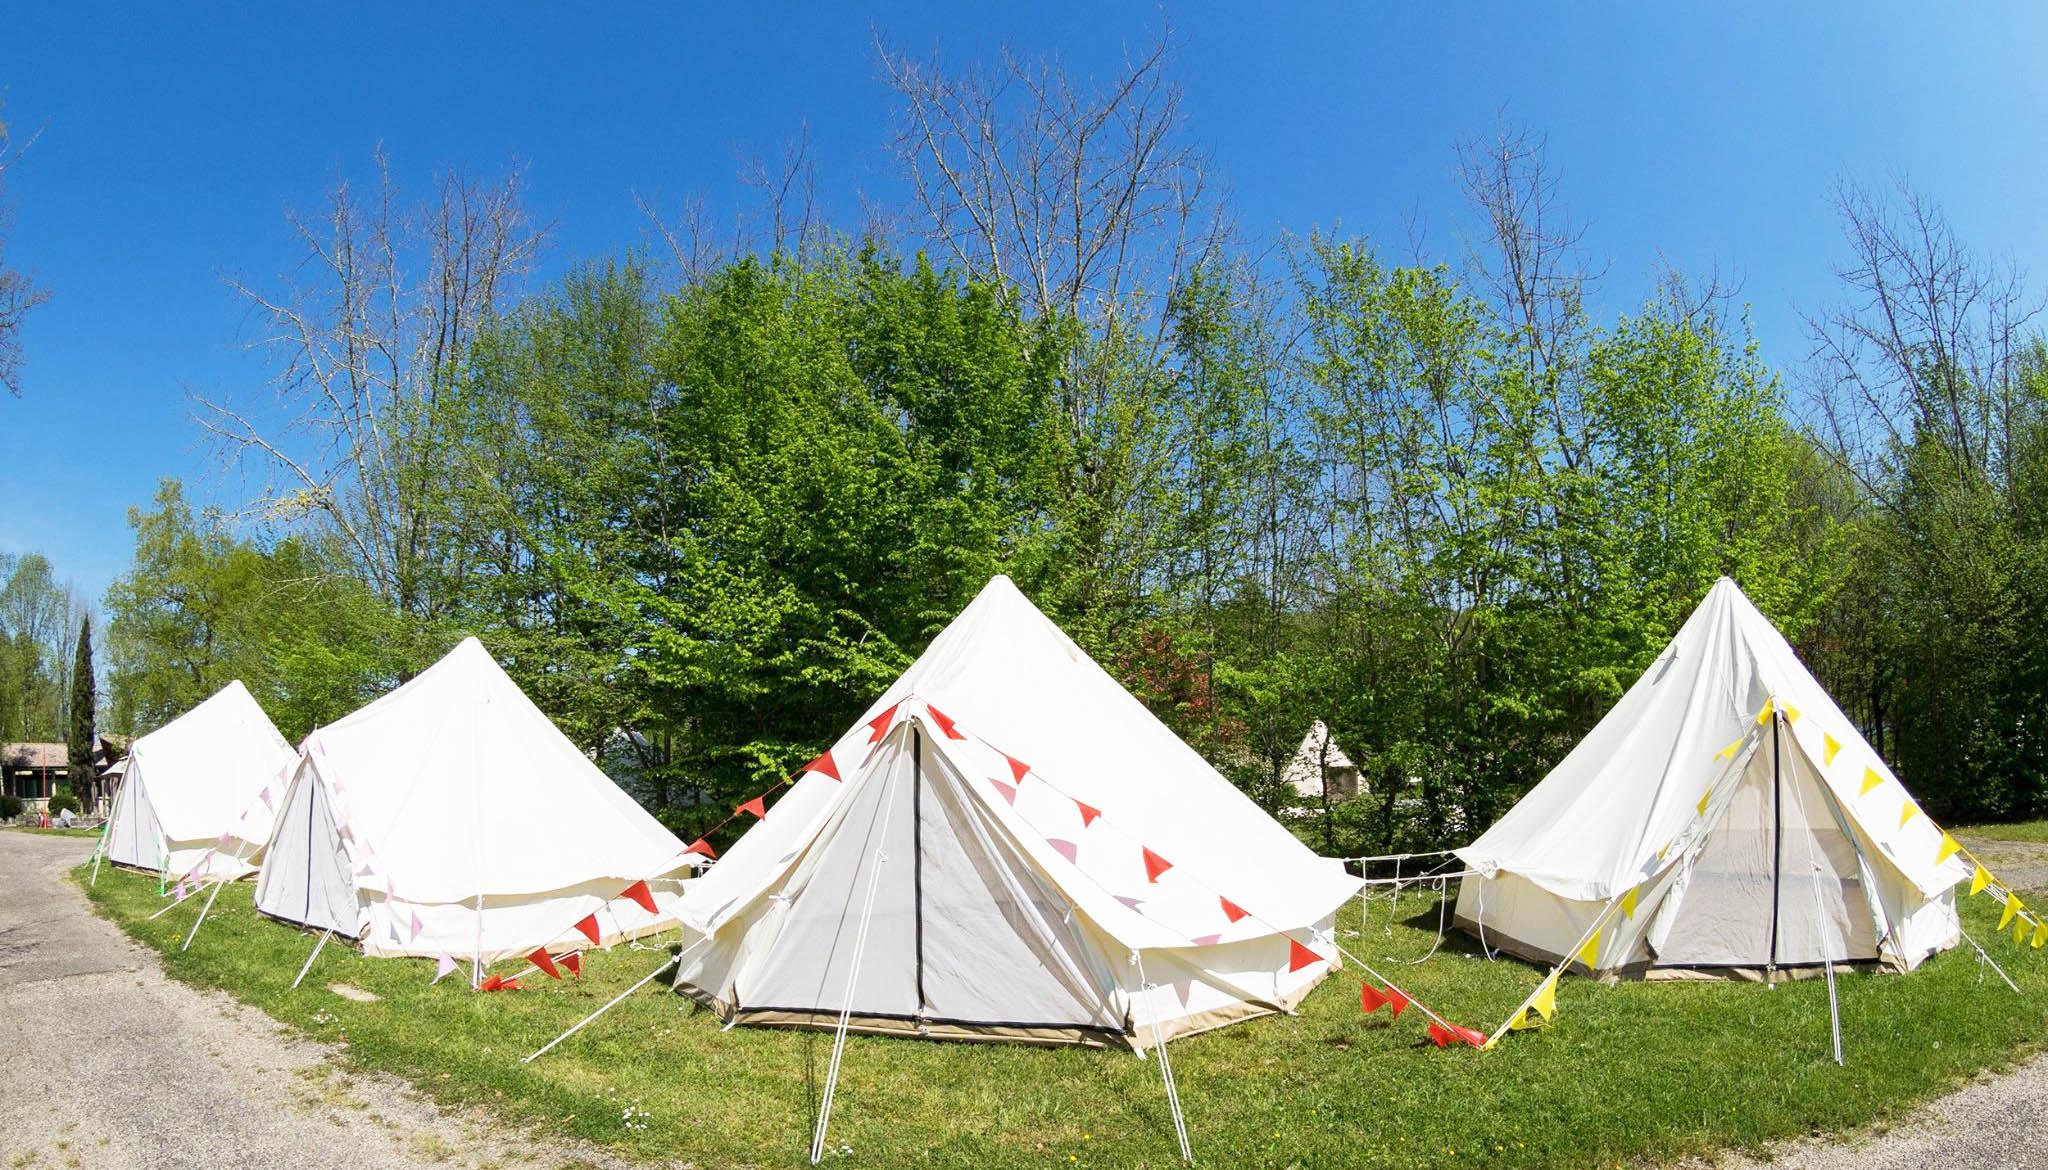 Billet + Garorock - Camping Sleep'em All - Tente Cloche